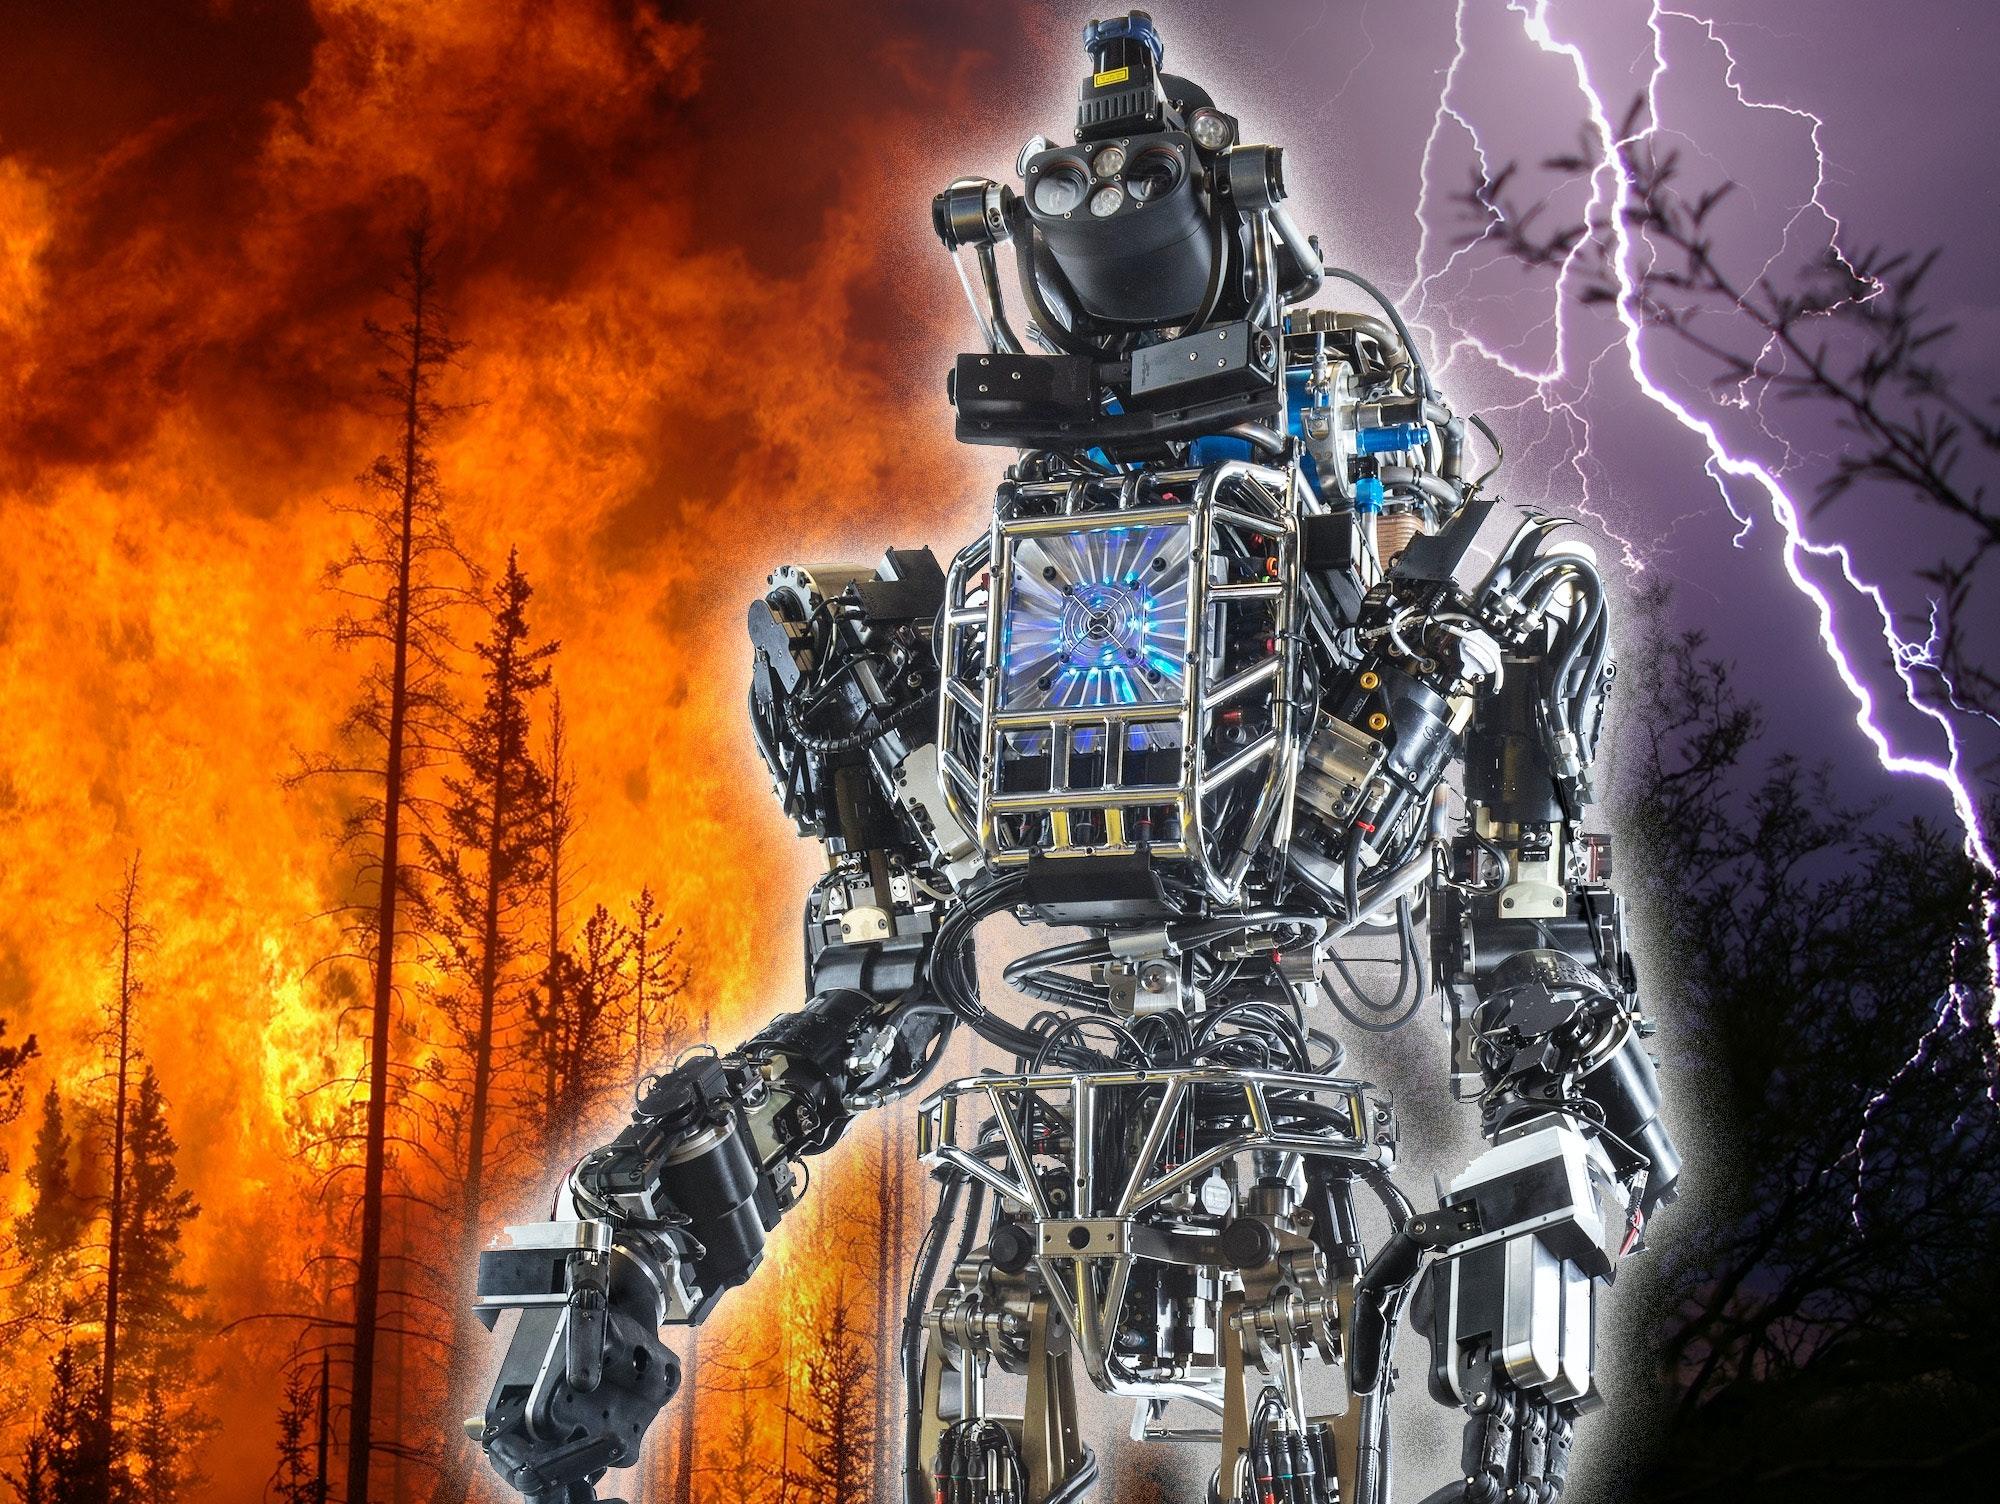 Researchers Have Developed an Algorithm to Make Robots Nimble